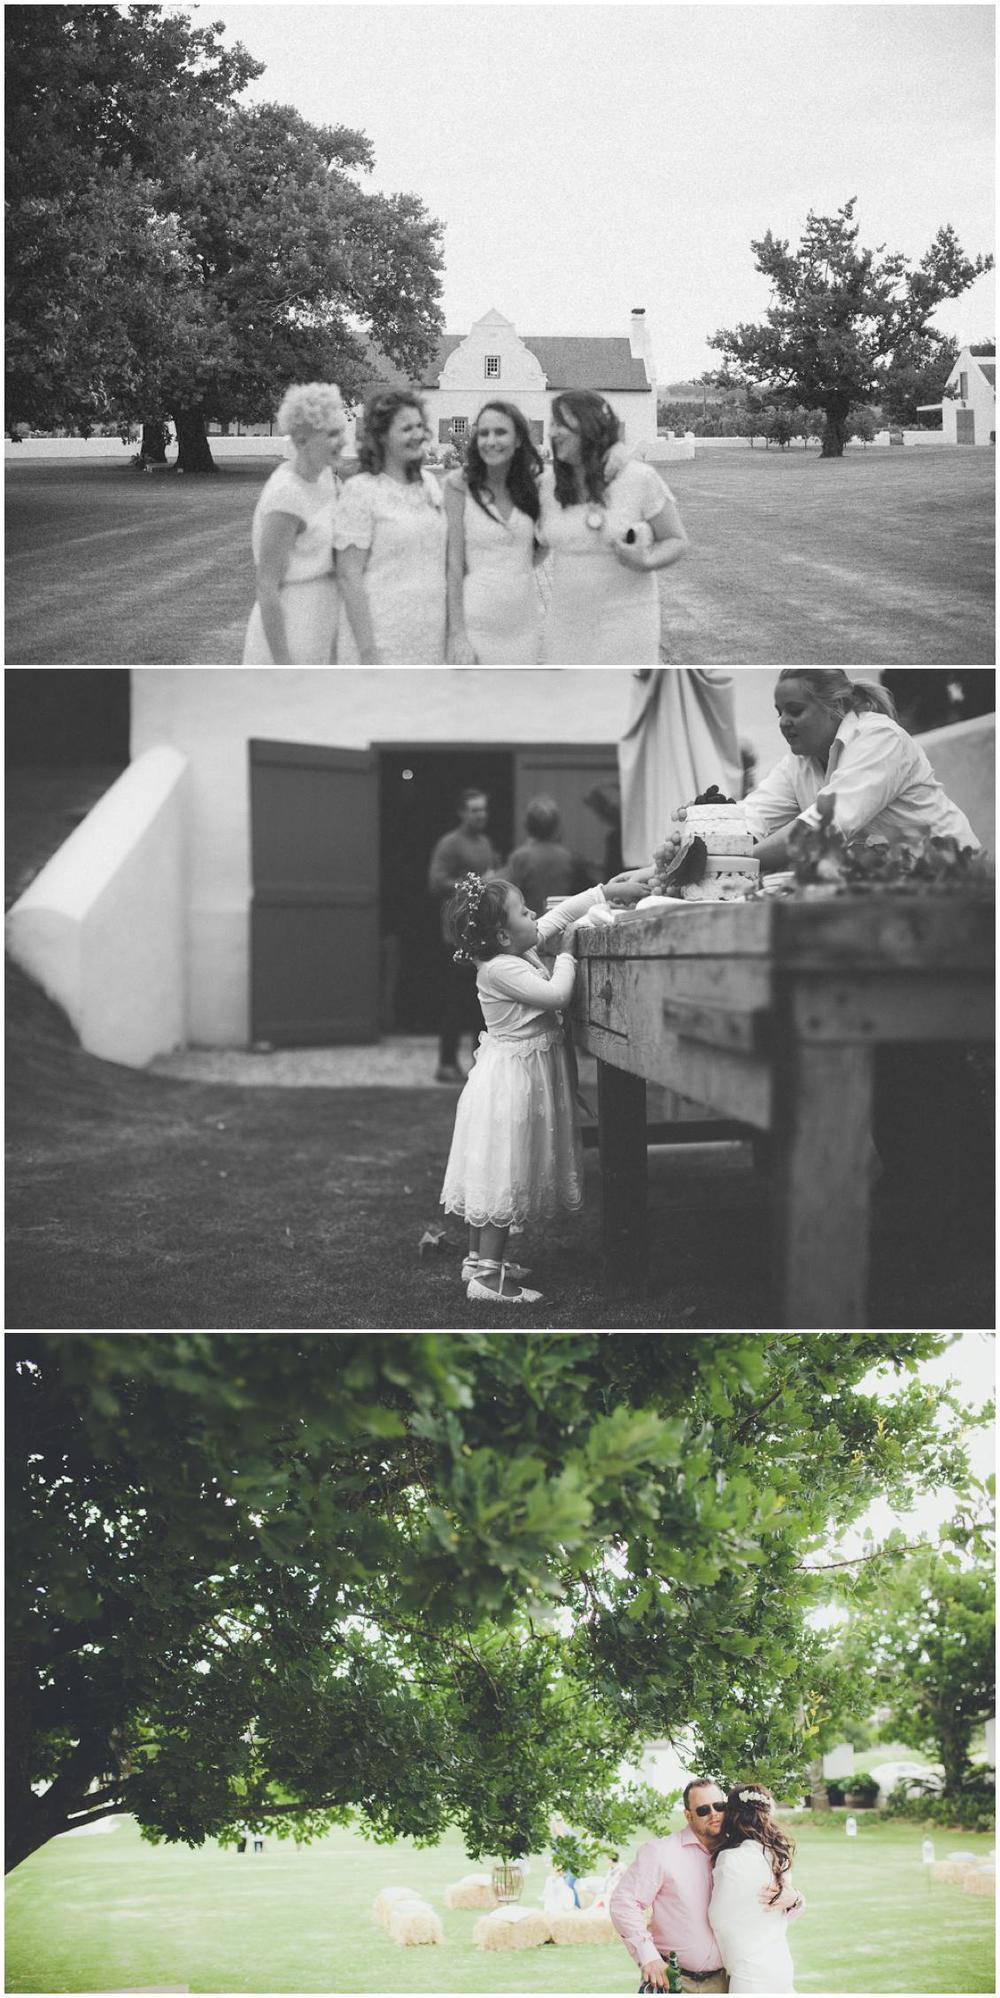 Ruan&Gina_TheOaks_FionaClairPhotography-120.jpg